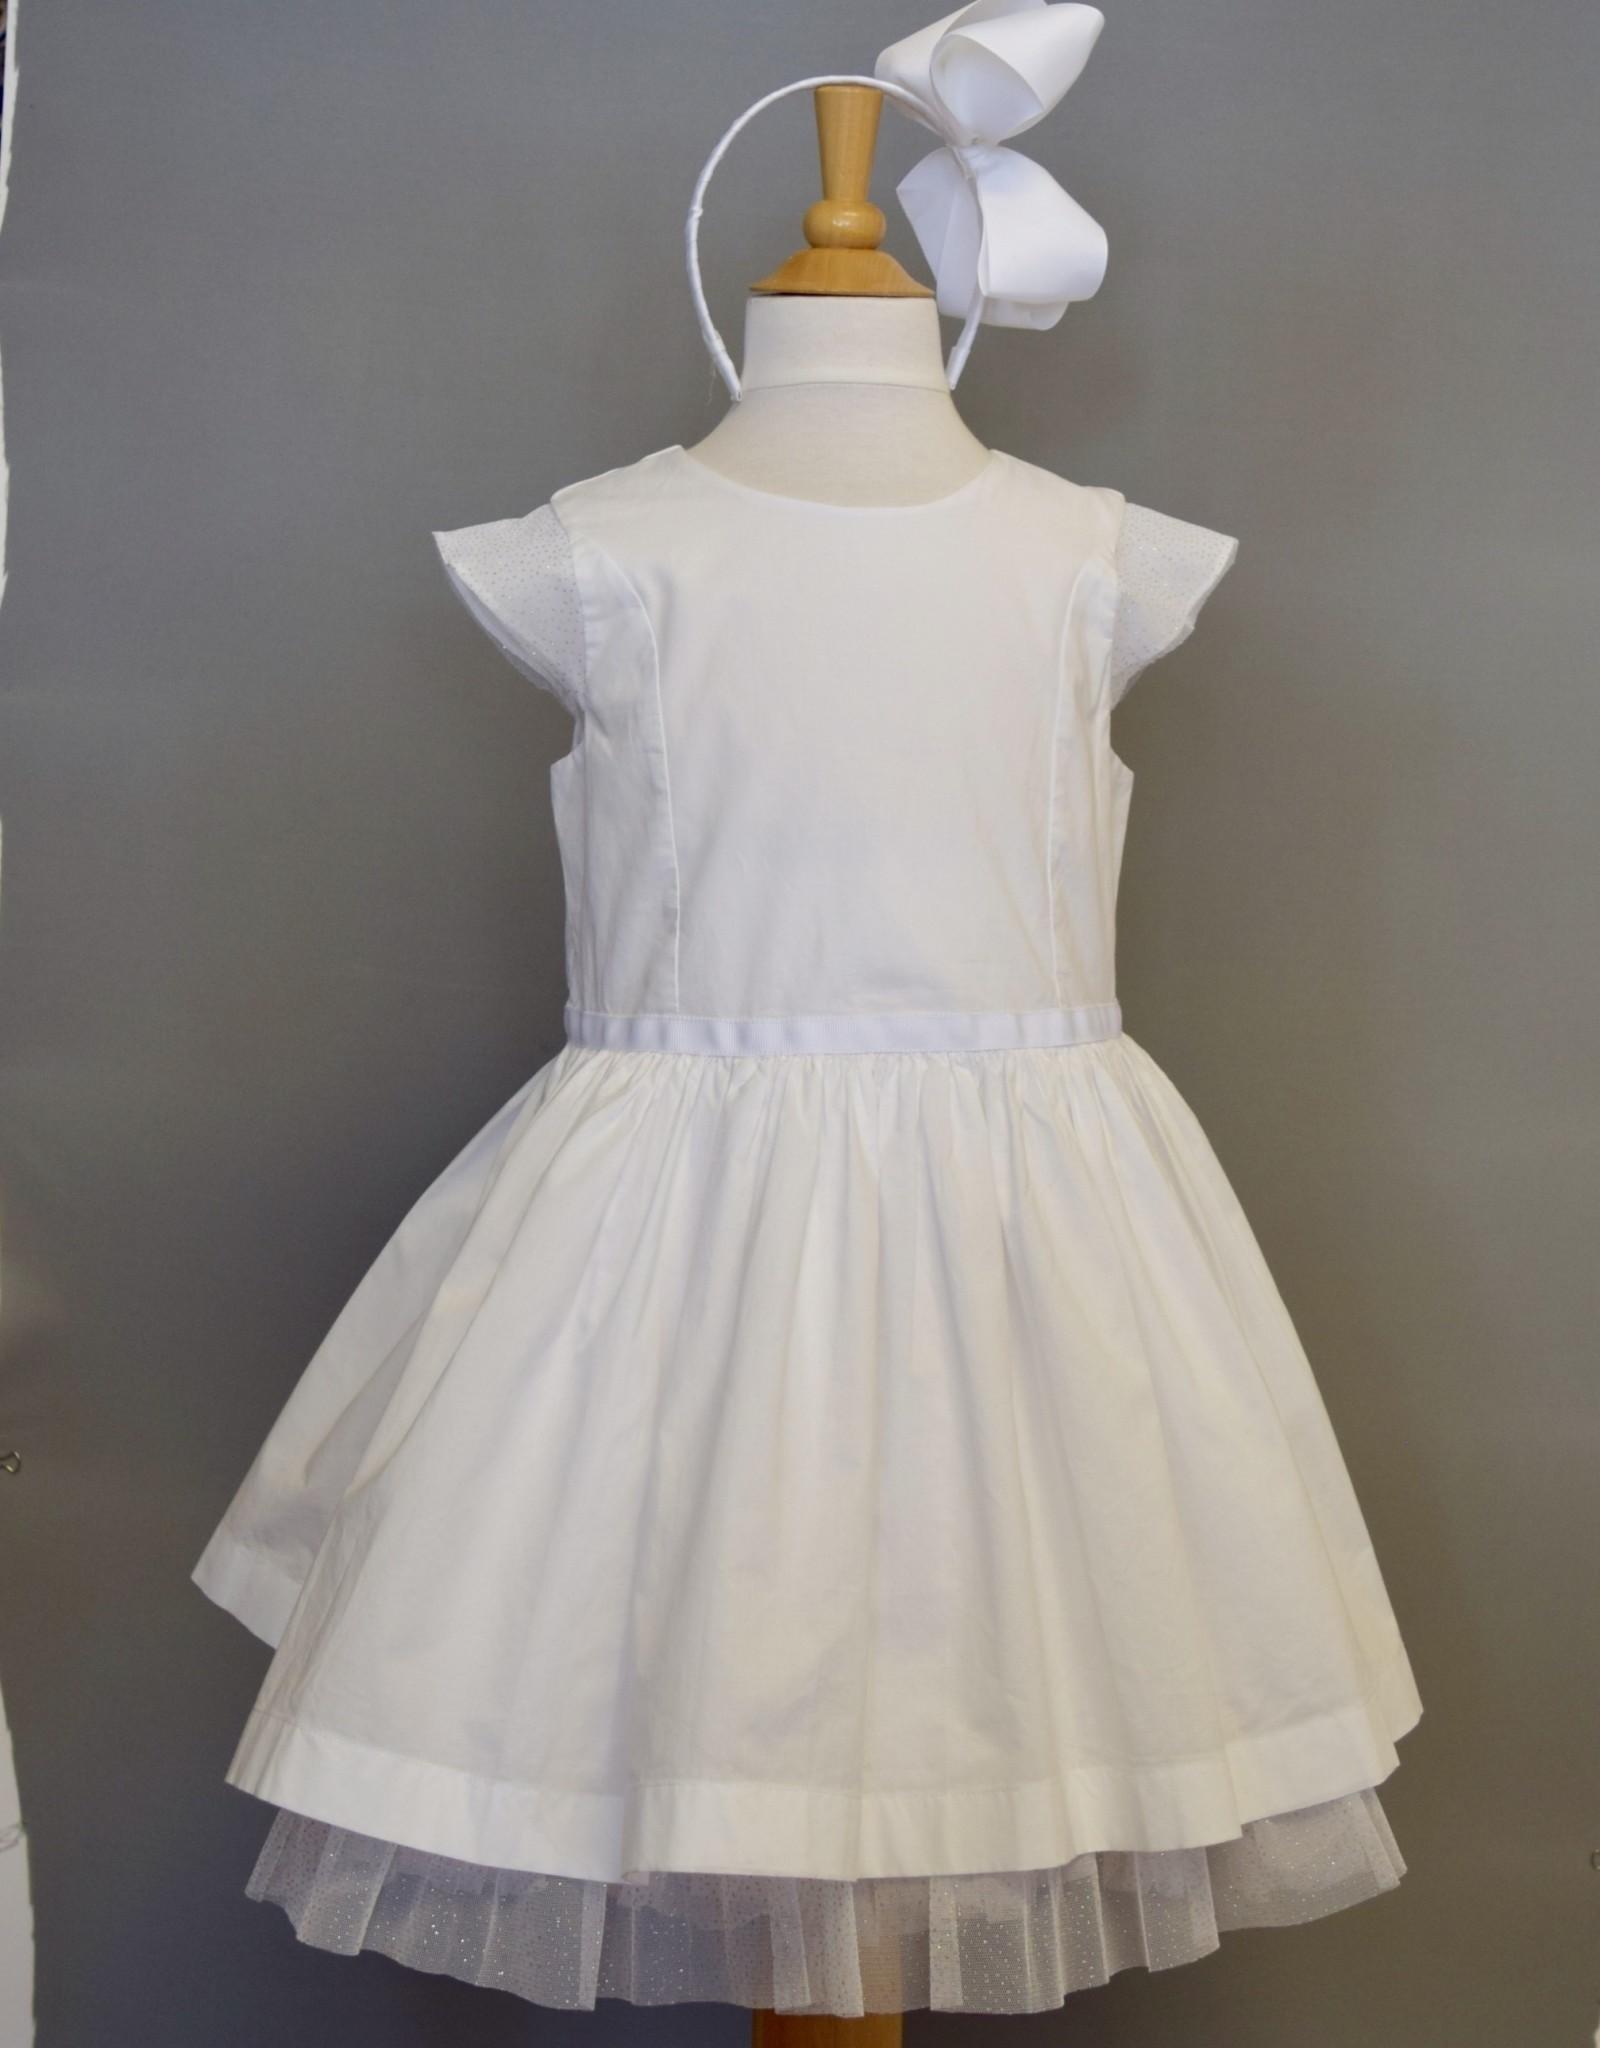 Petit Bateau White Cotton & Tulle Dress